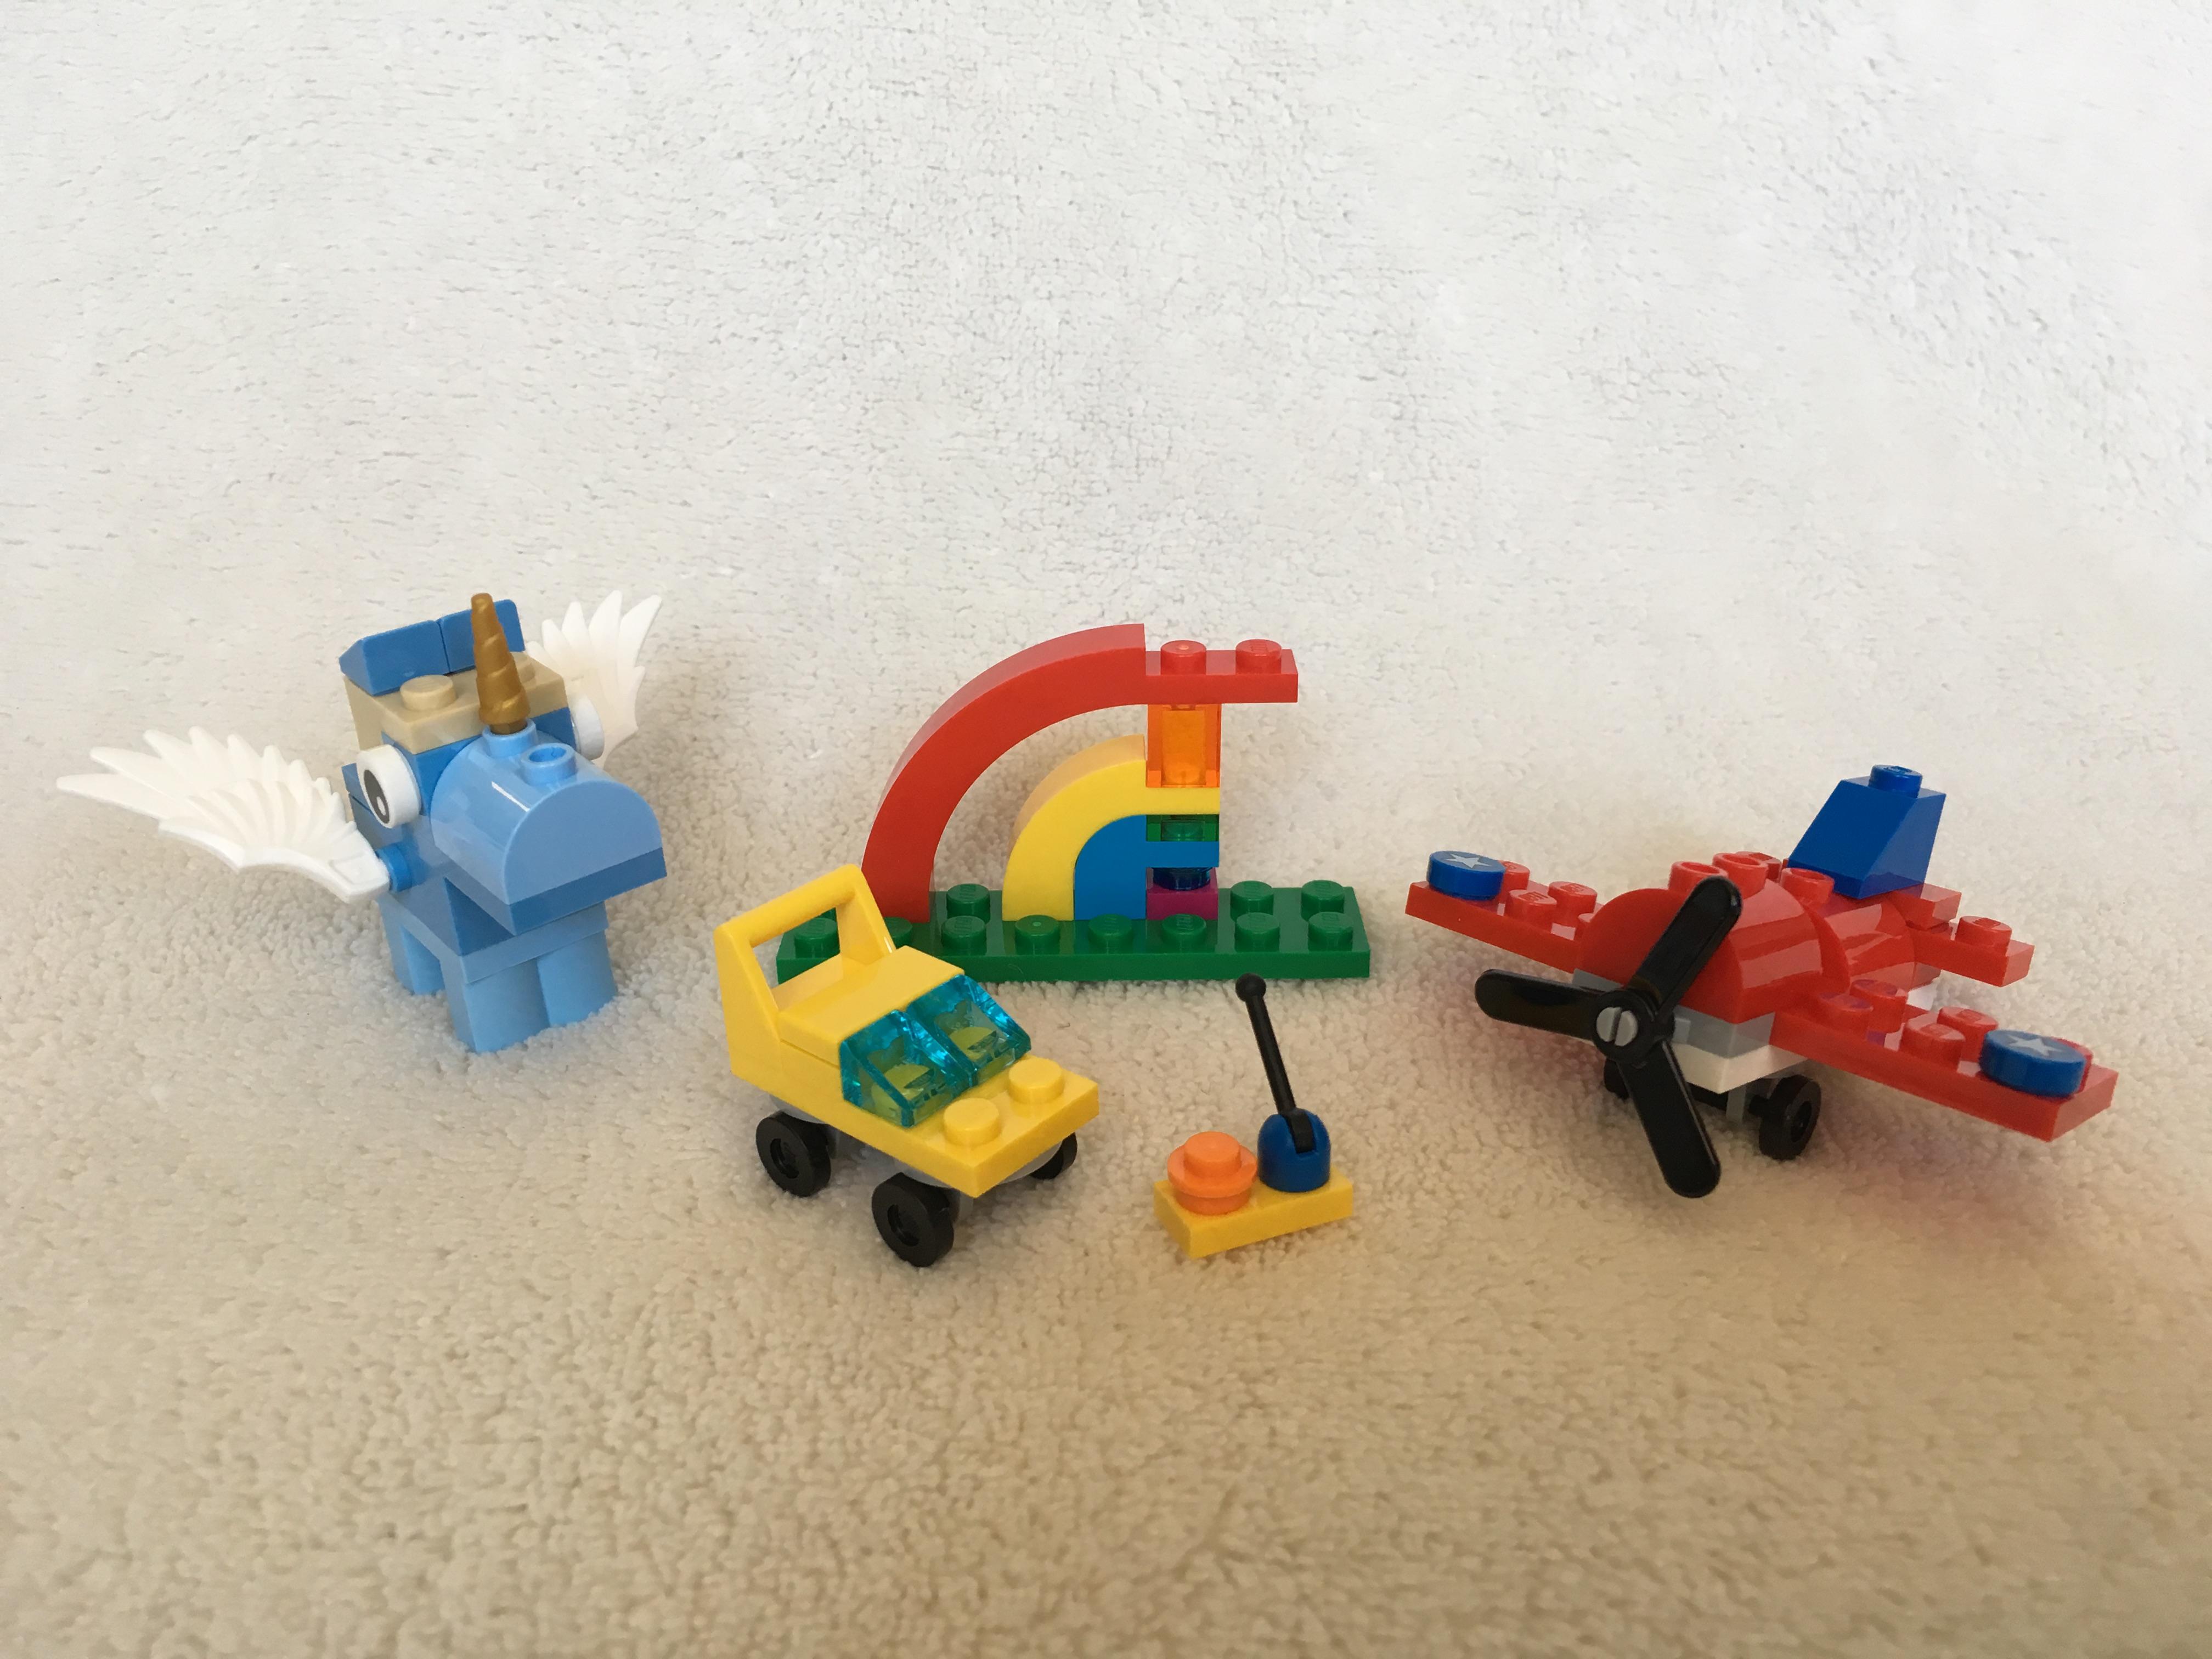 Lego 10401 Rainbow Fun Brick Geek